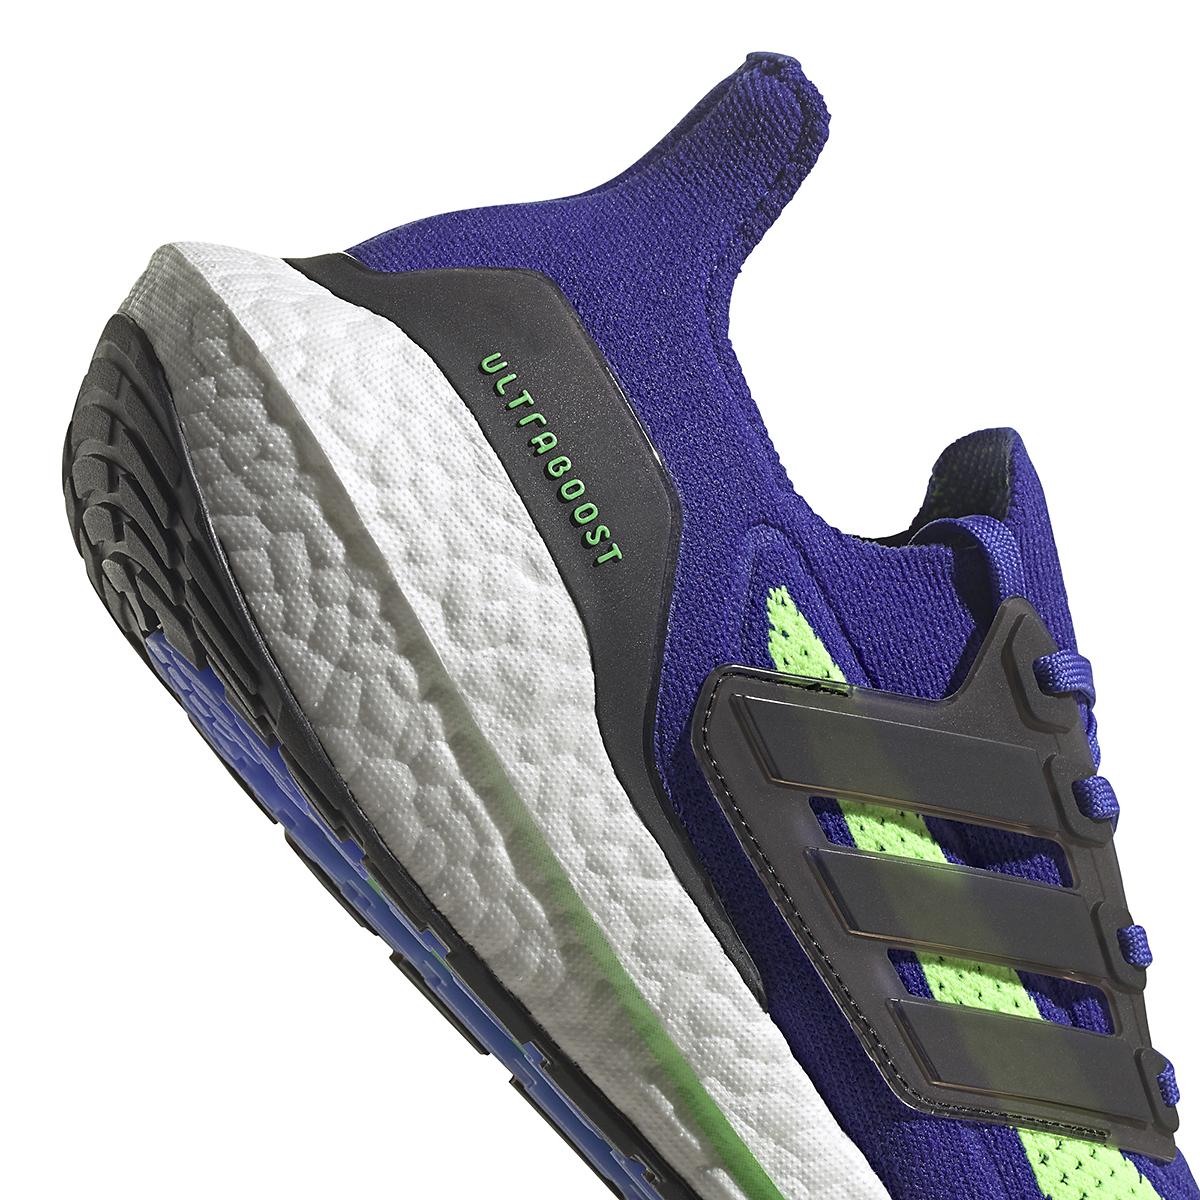 Men's Adidas UltraBOOST 21 Running Shoe - Color: Sonic Ink/Core Black/Screaming Green - Size: 6 - Width: Regular, Sonic Ink/Core Black/Screaming Green, large, image 4